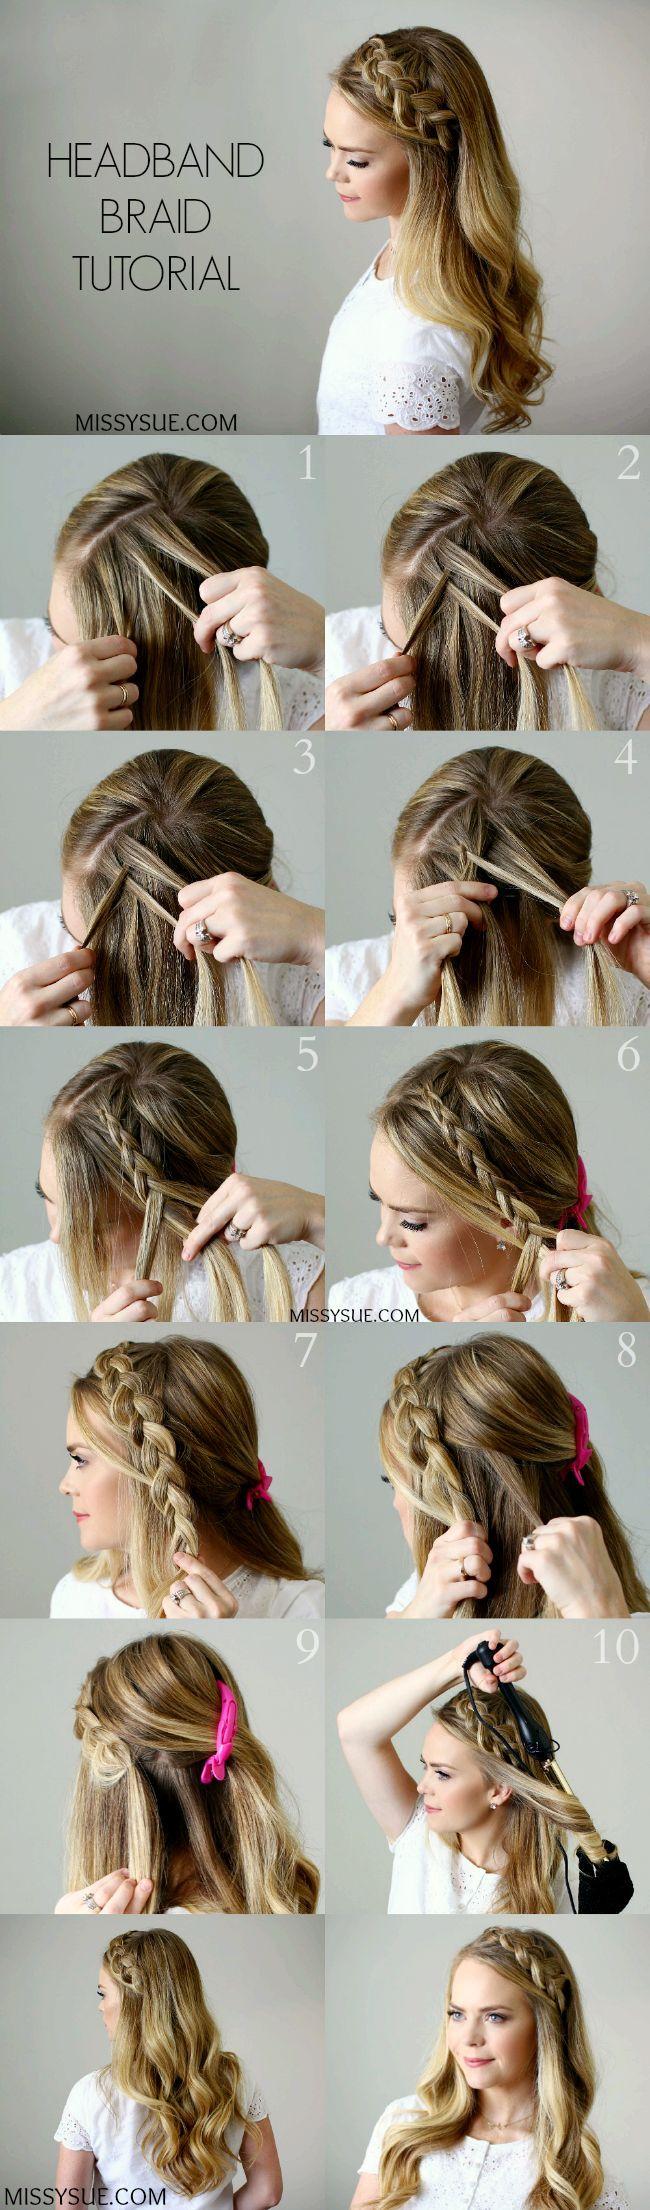 Headband Braid – Style Like Pro